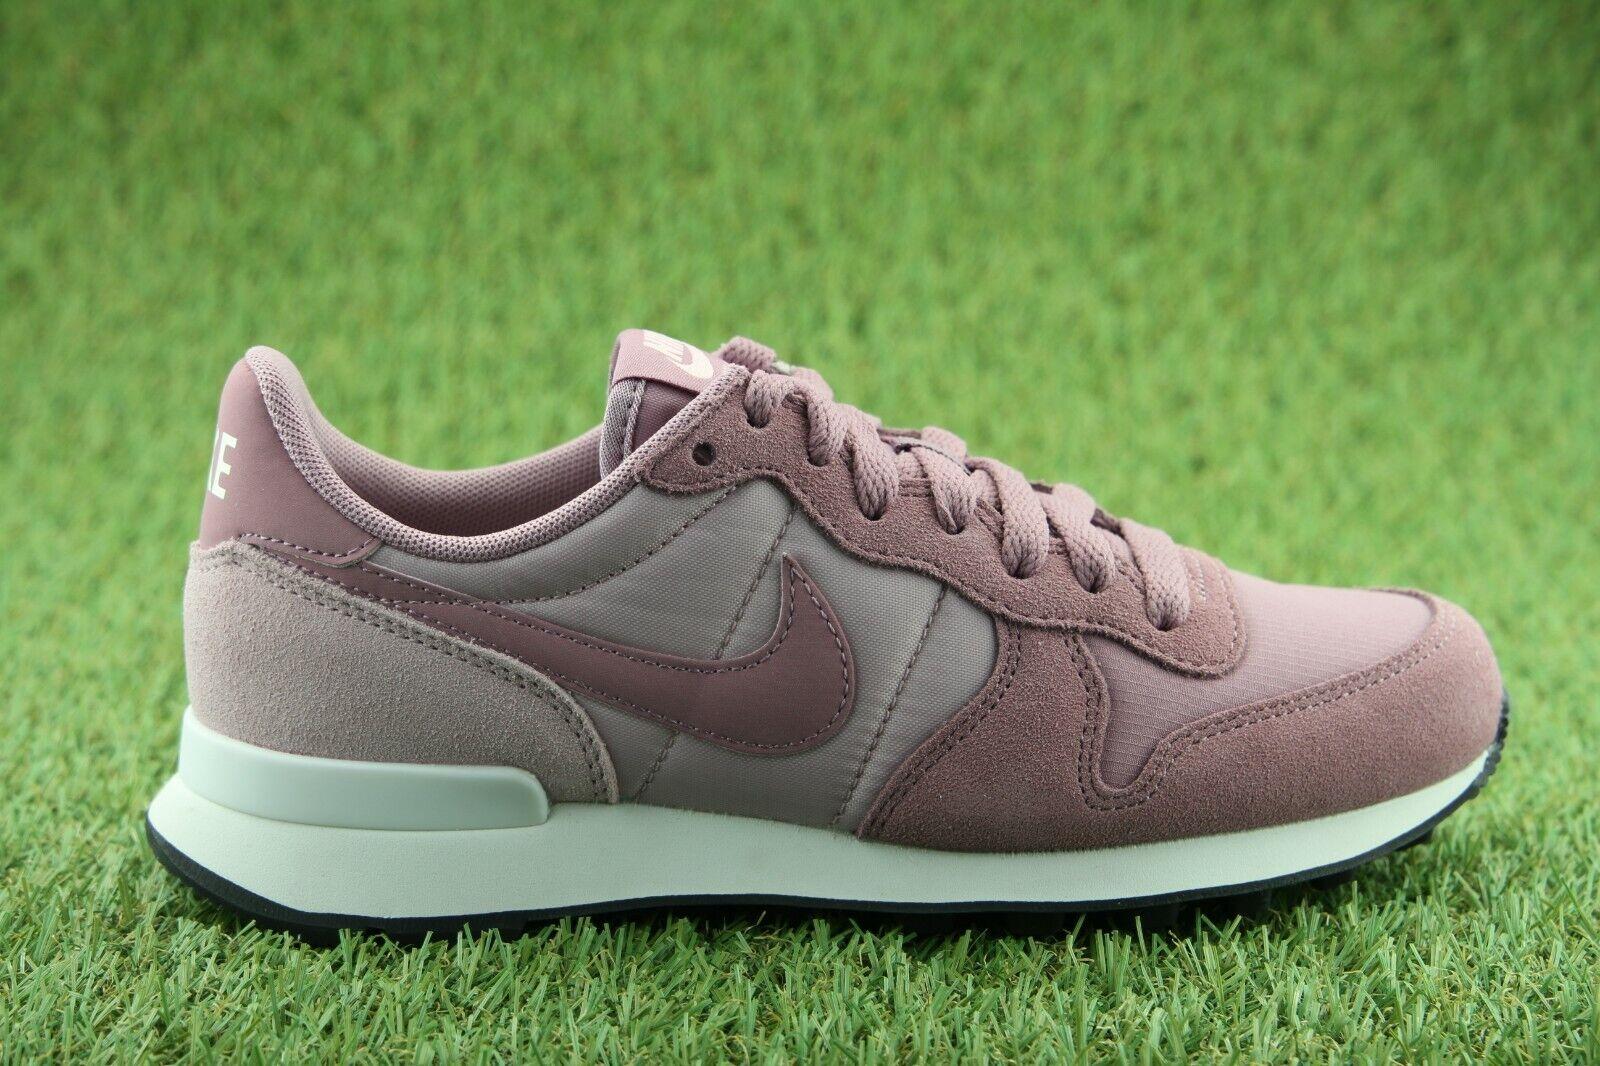 Nike Internationalist Damen Schuhe Turnschuhe Running